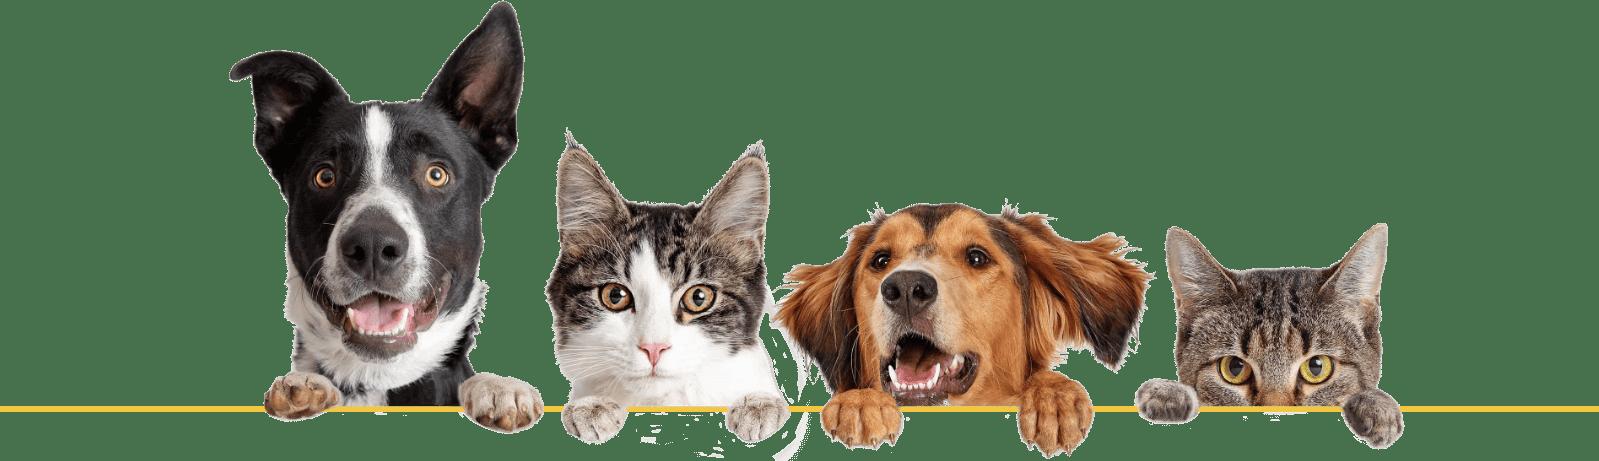 Dog Cat Banner Border Less